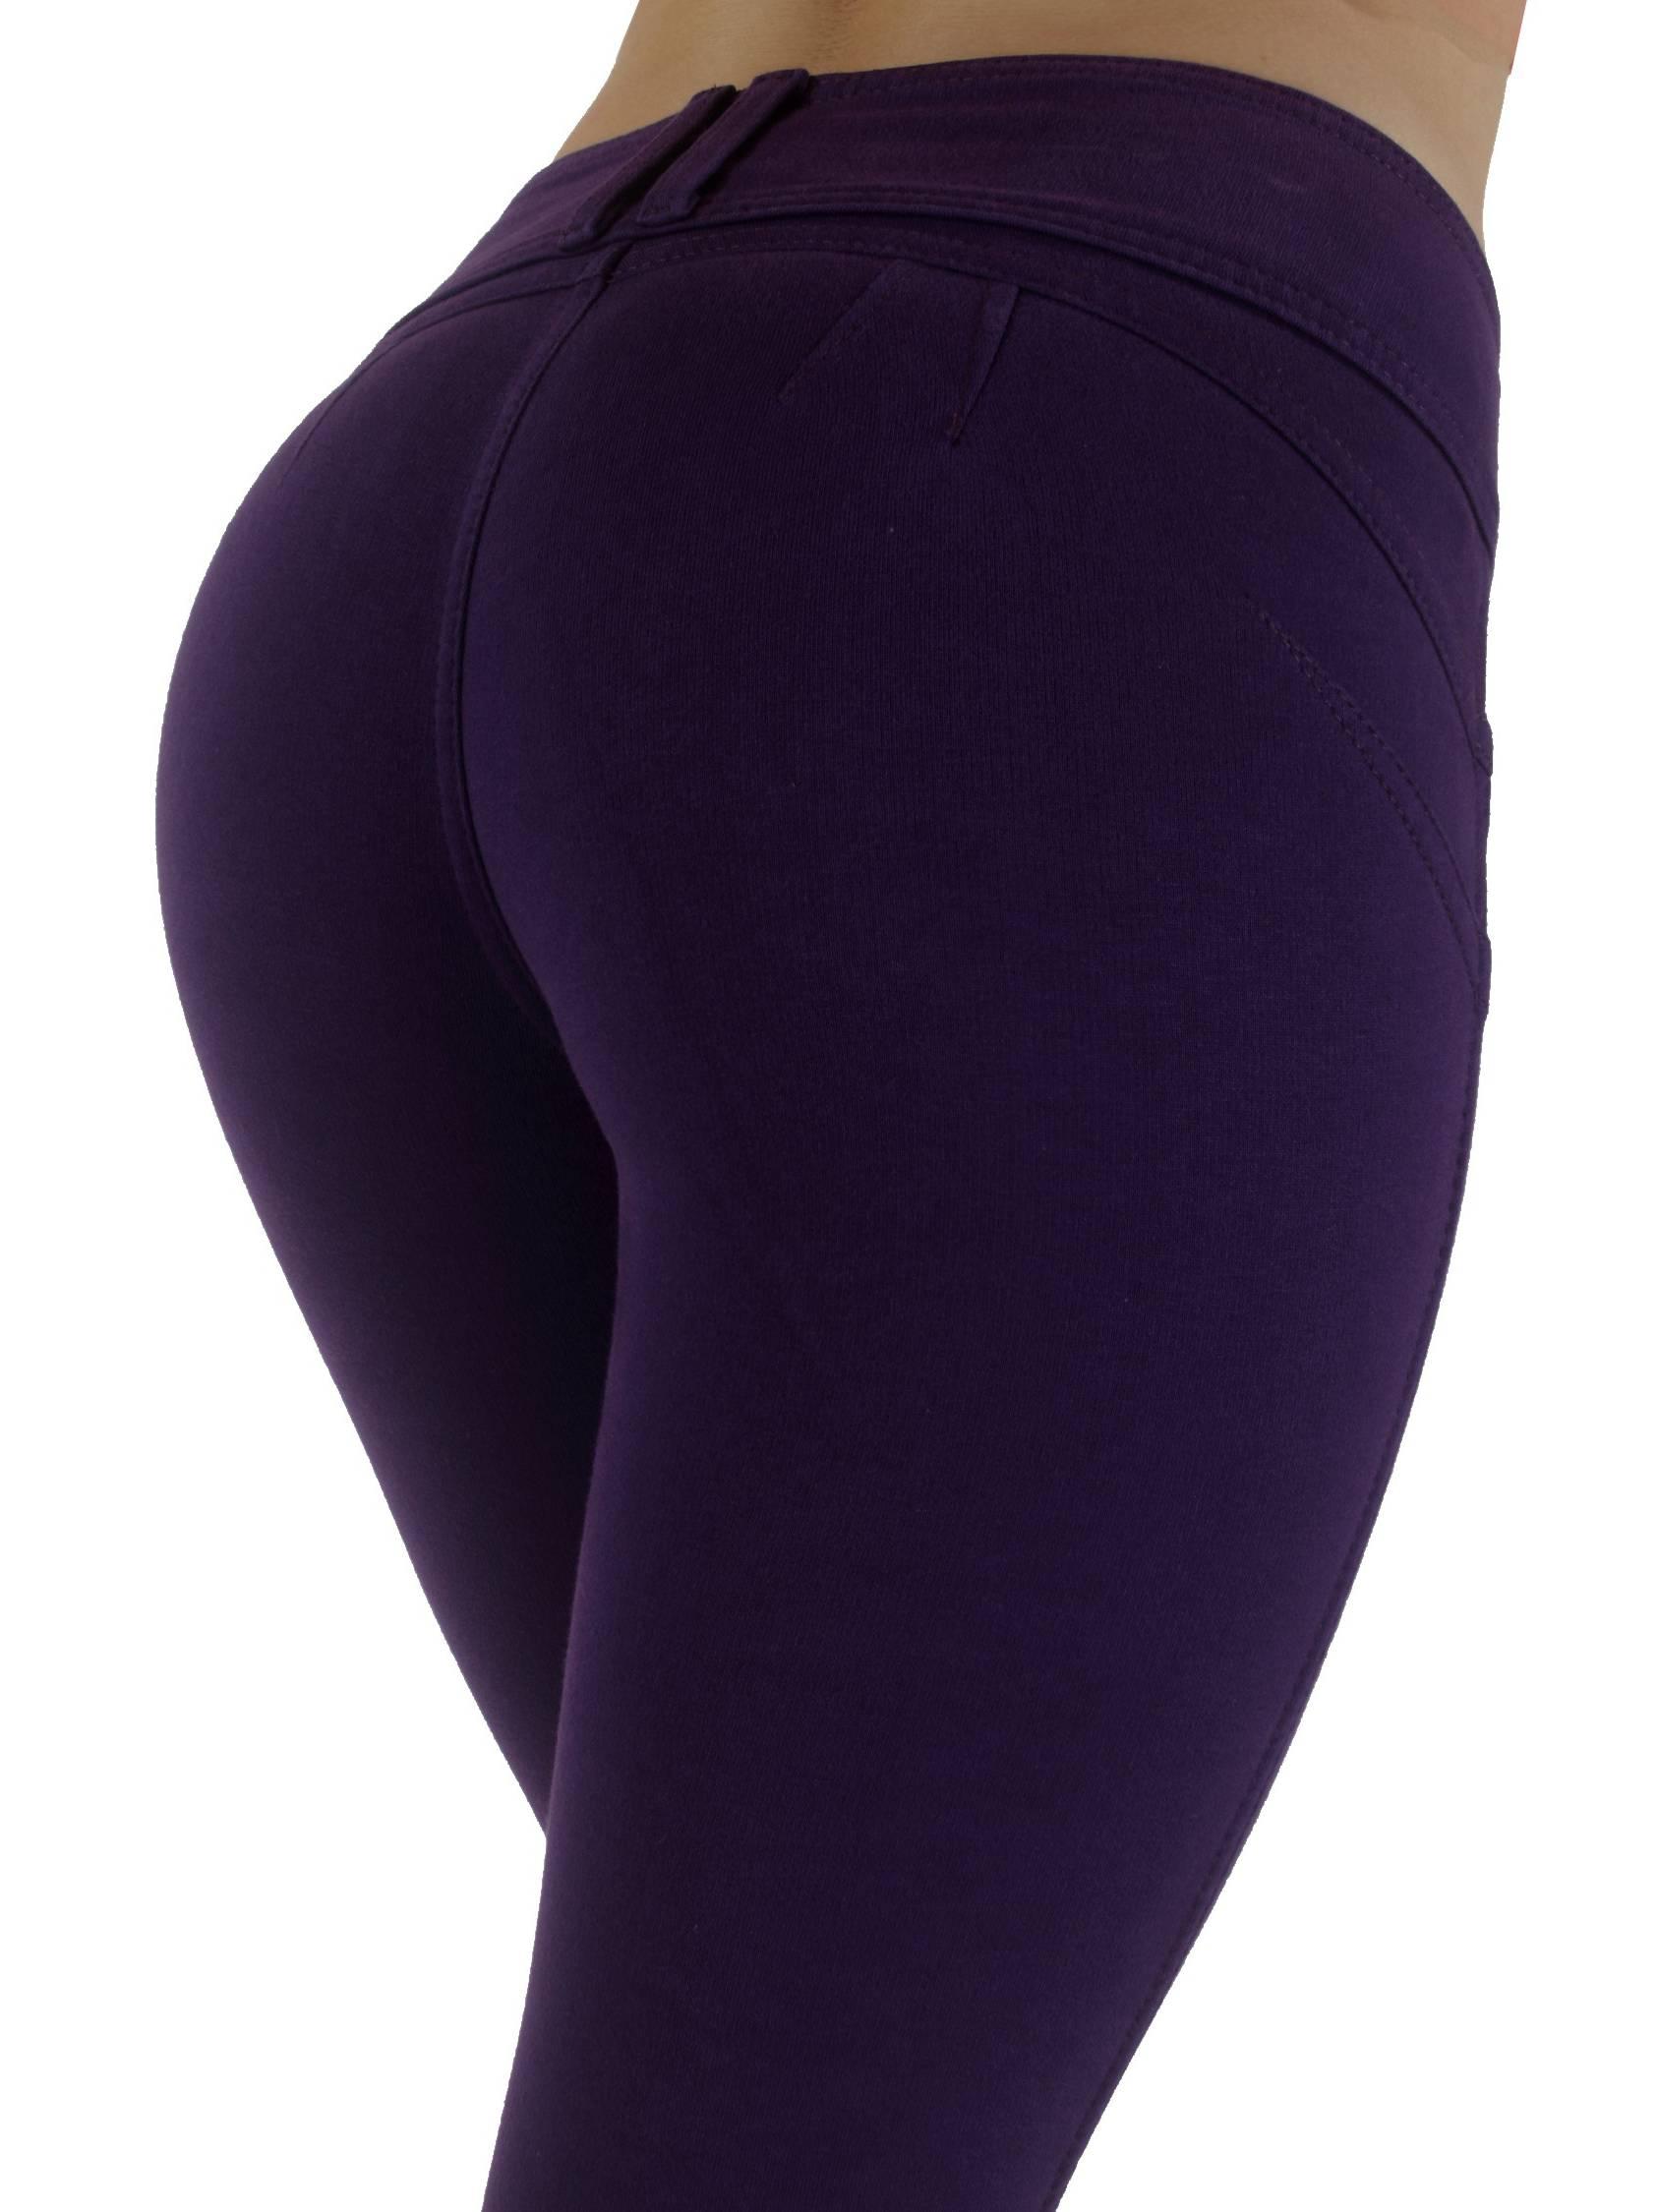 Premium Stretch Cotton,Butt lift,Levanta Cola,Skinny Leg Fashion Pants-25 Colors